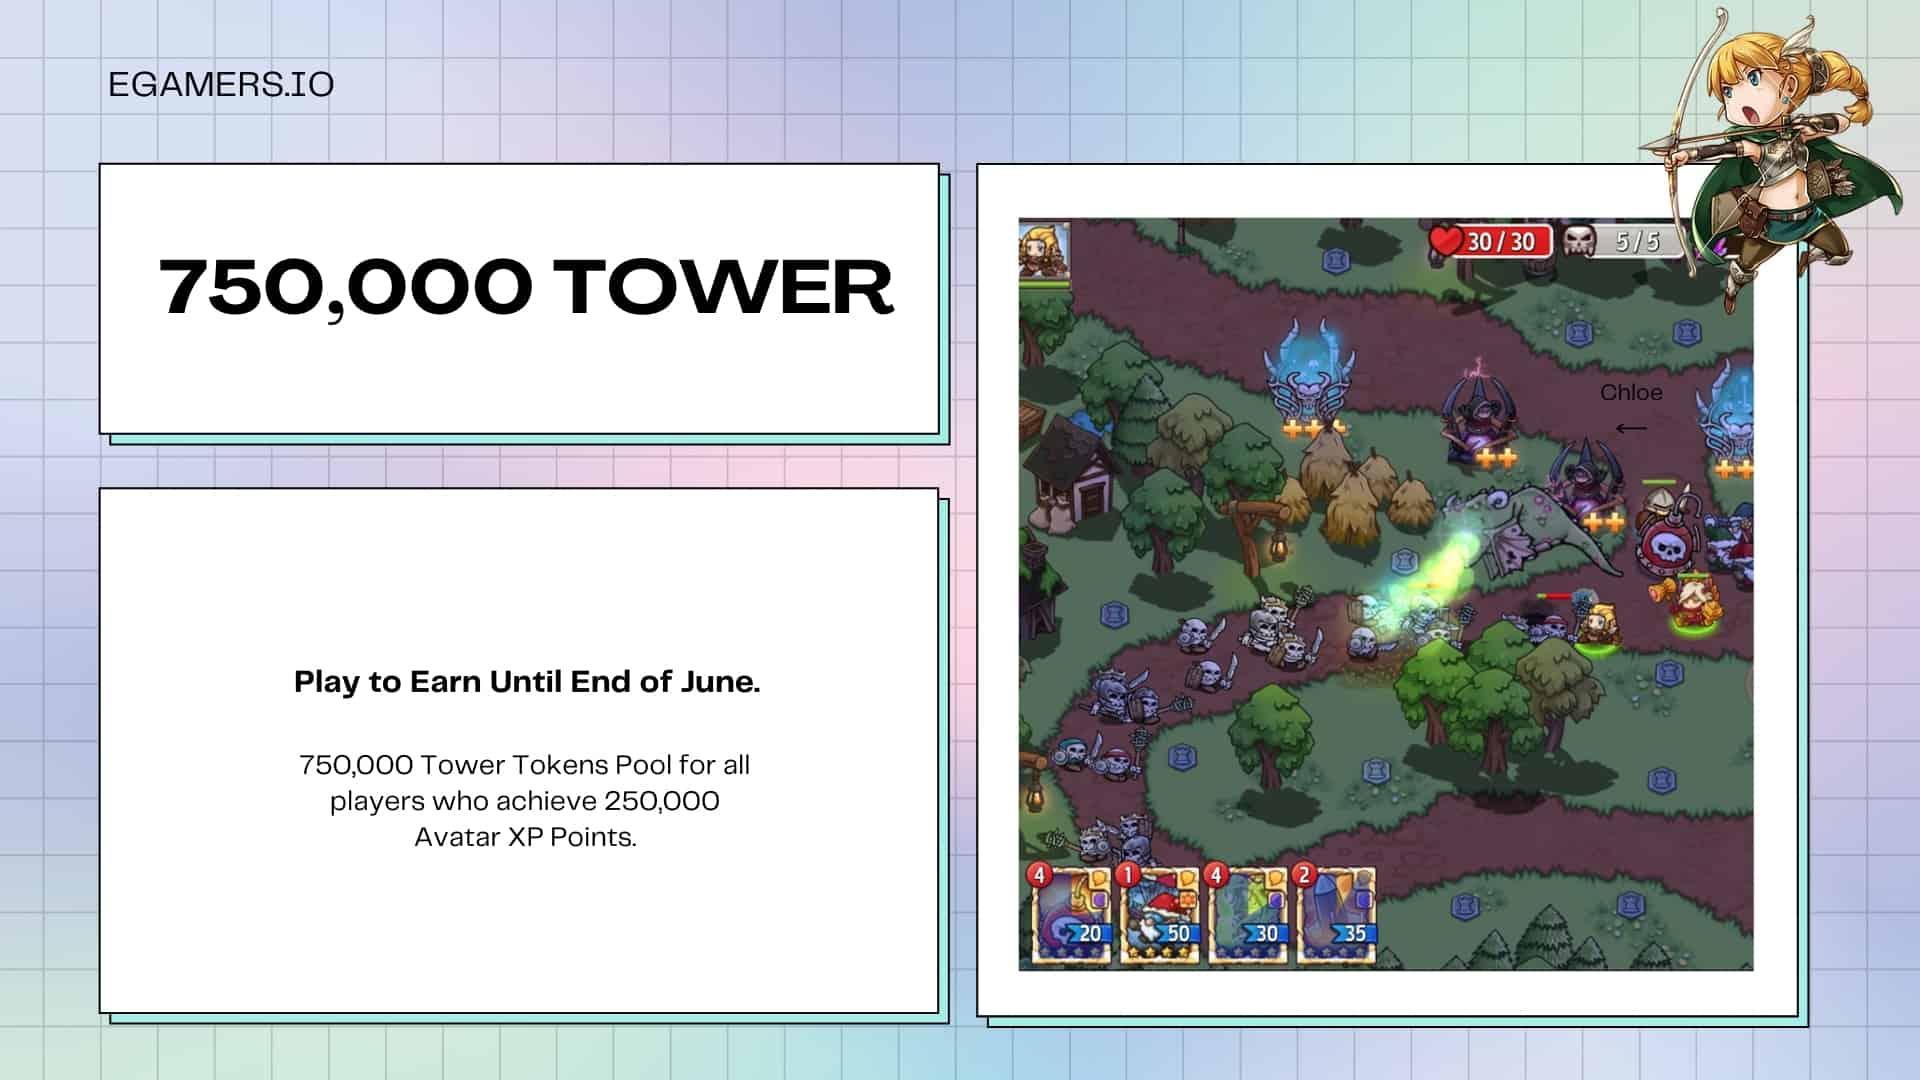 Crazy Defense Heroesplayers can earn freeTOWERtokens